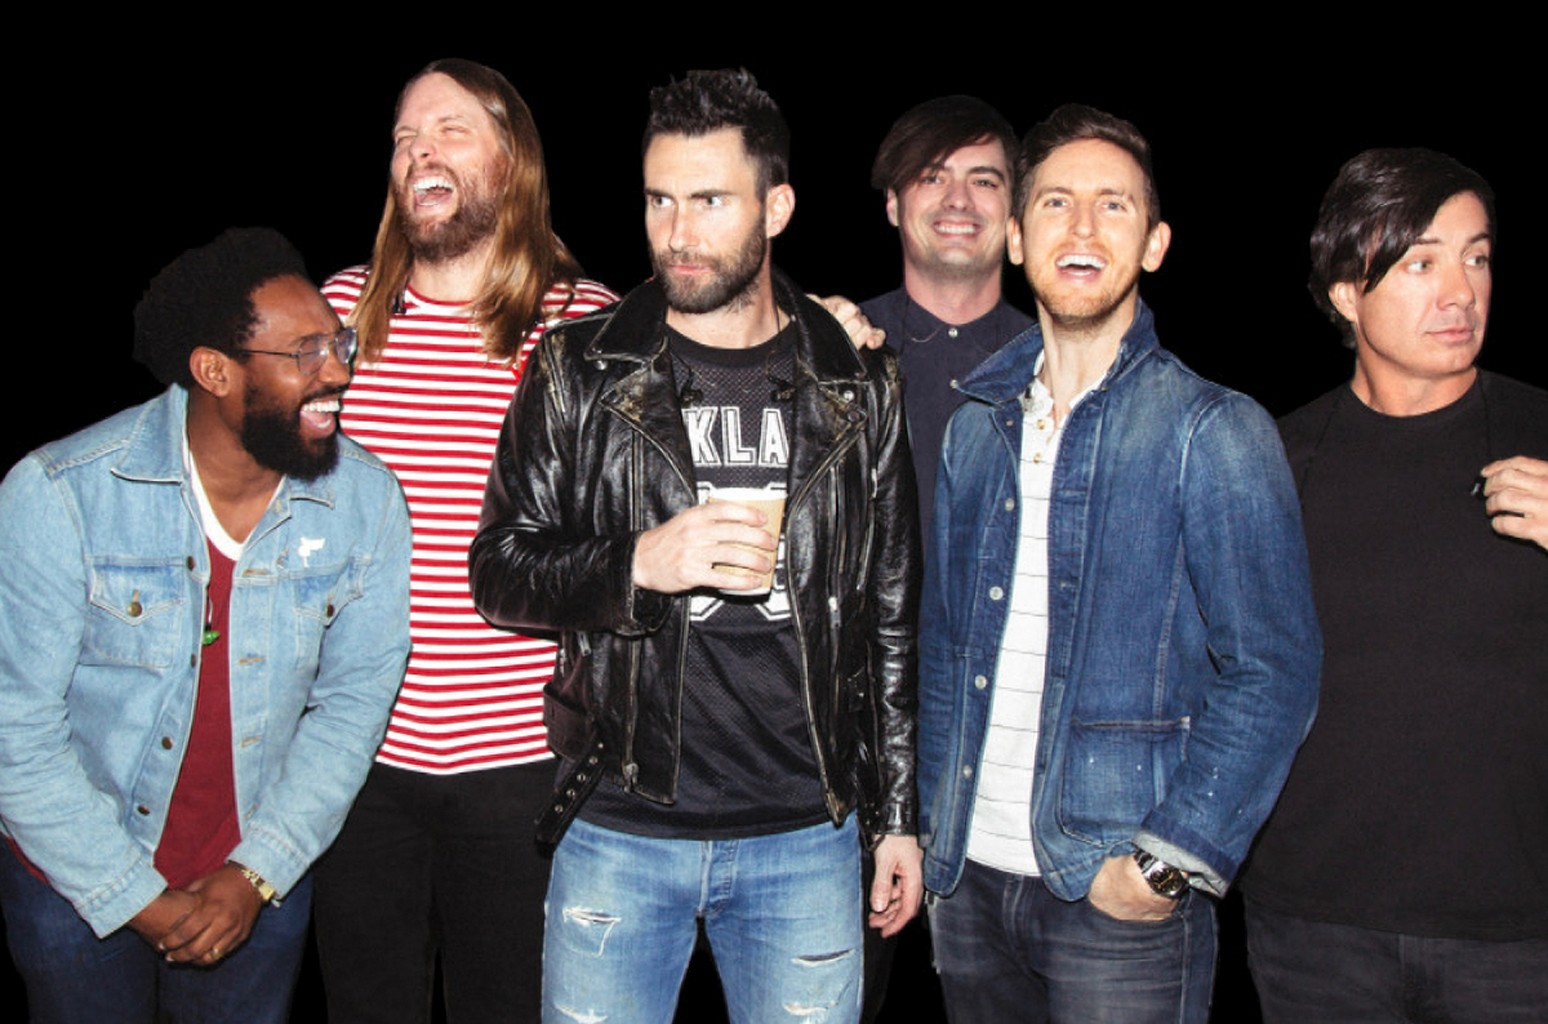 Maroon 5 Foto,Maroon 5 Tendências Do Twitter - Top Tweets